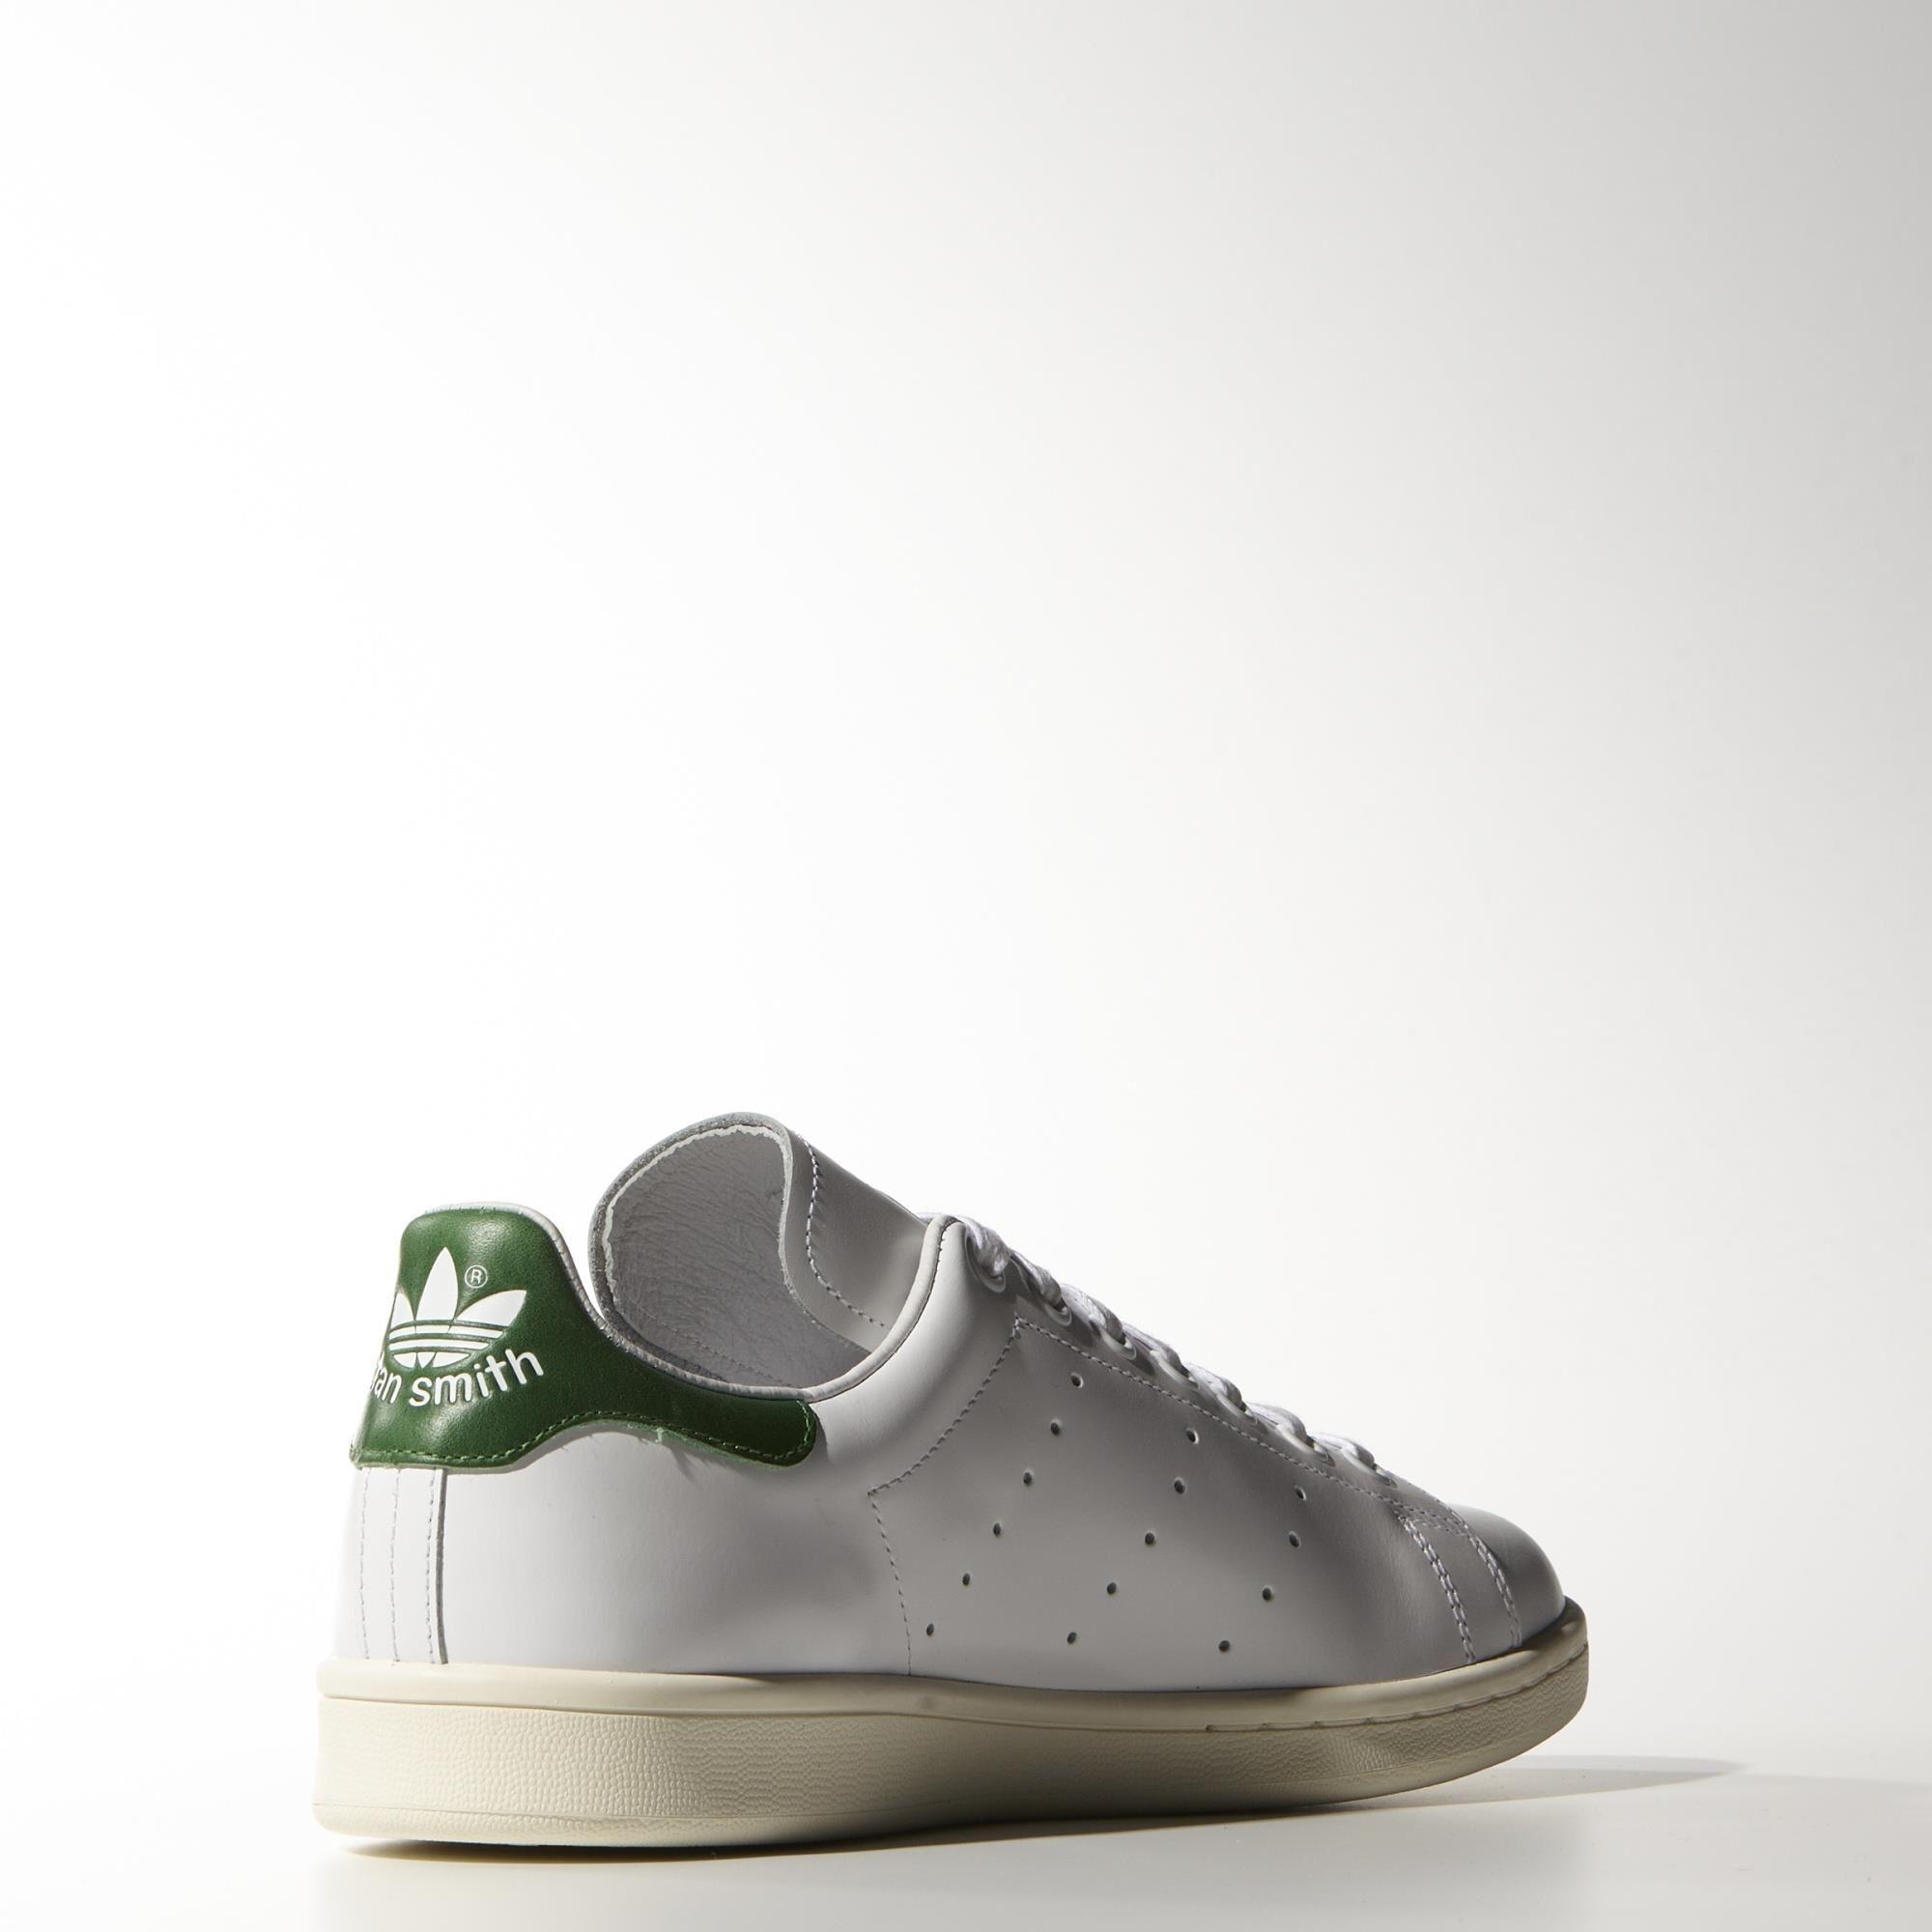 new product 8b64e f0b6c Adidas Stan Smith